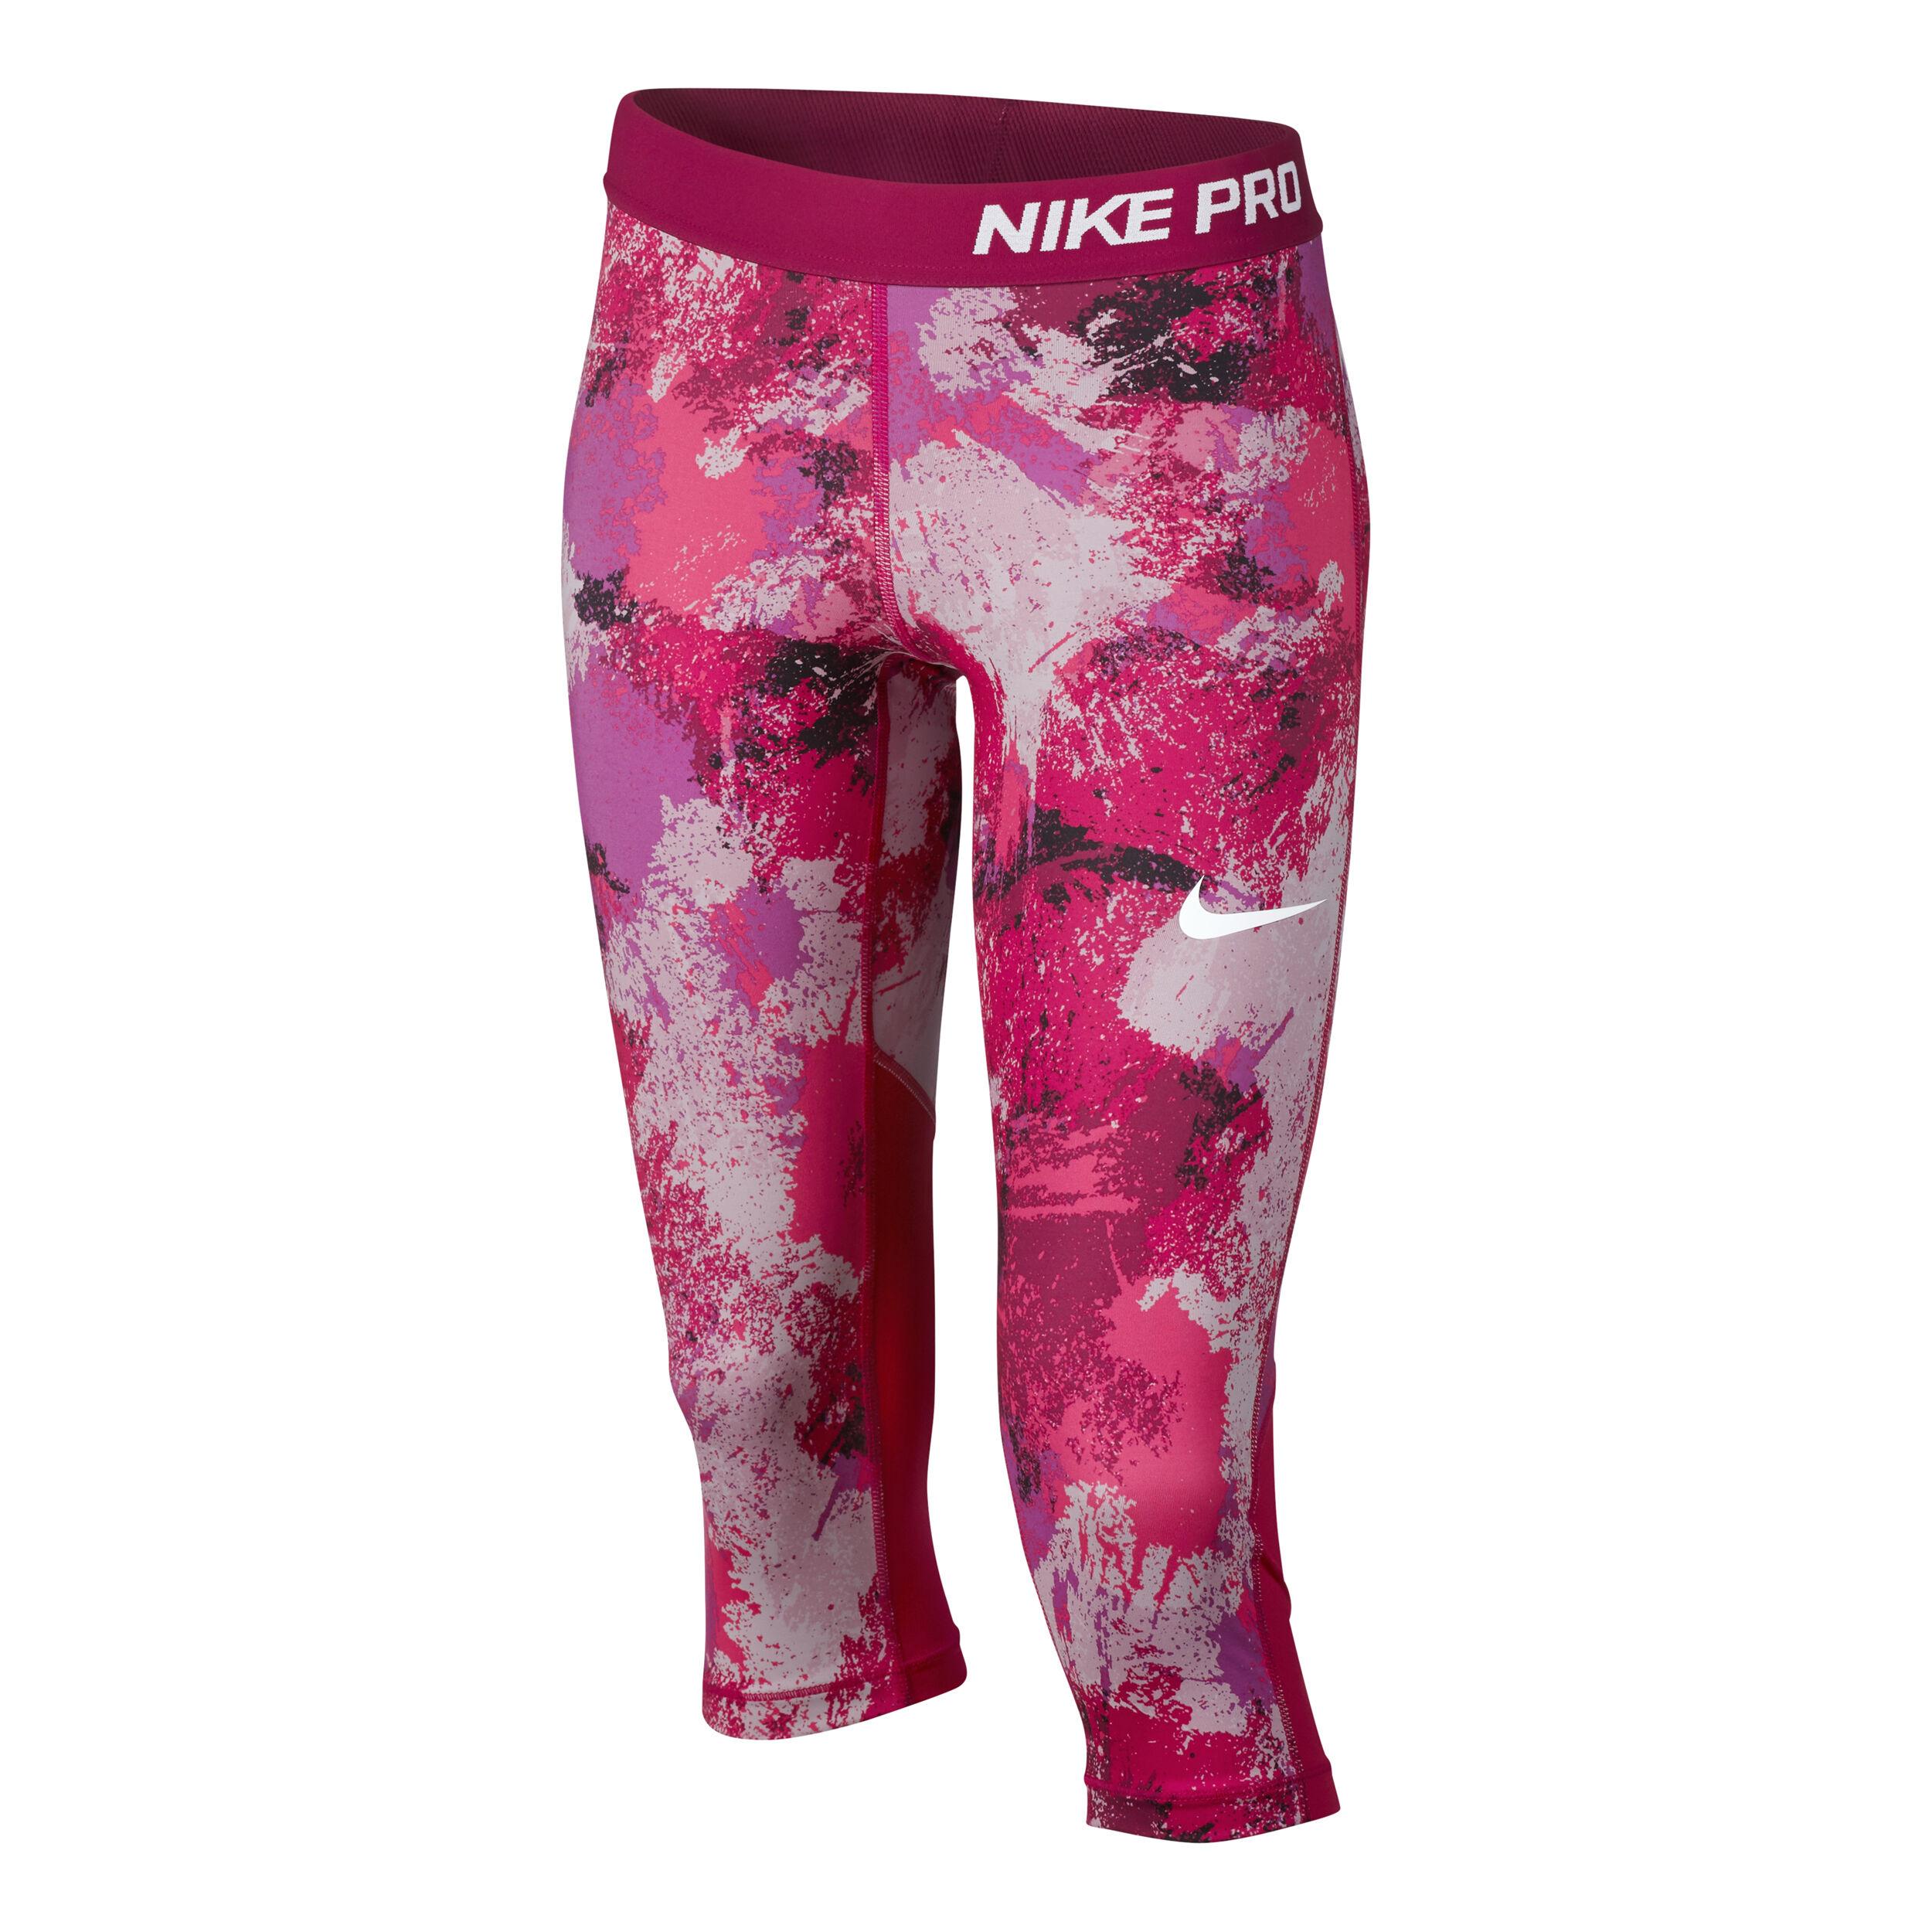 Nike Pro Cool Capri Hose Mädchen Pink, Lila